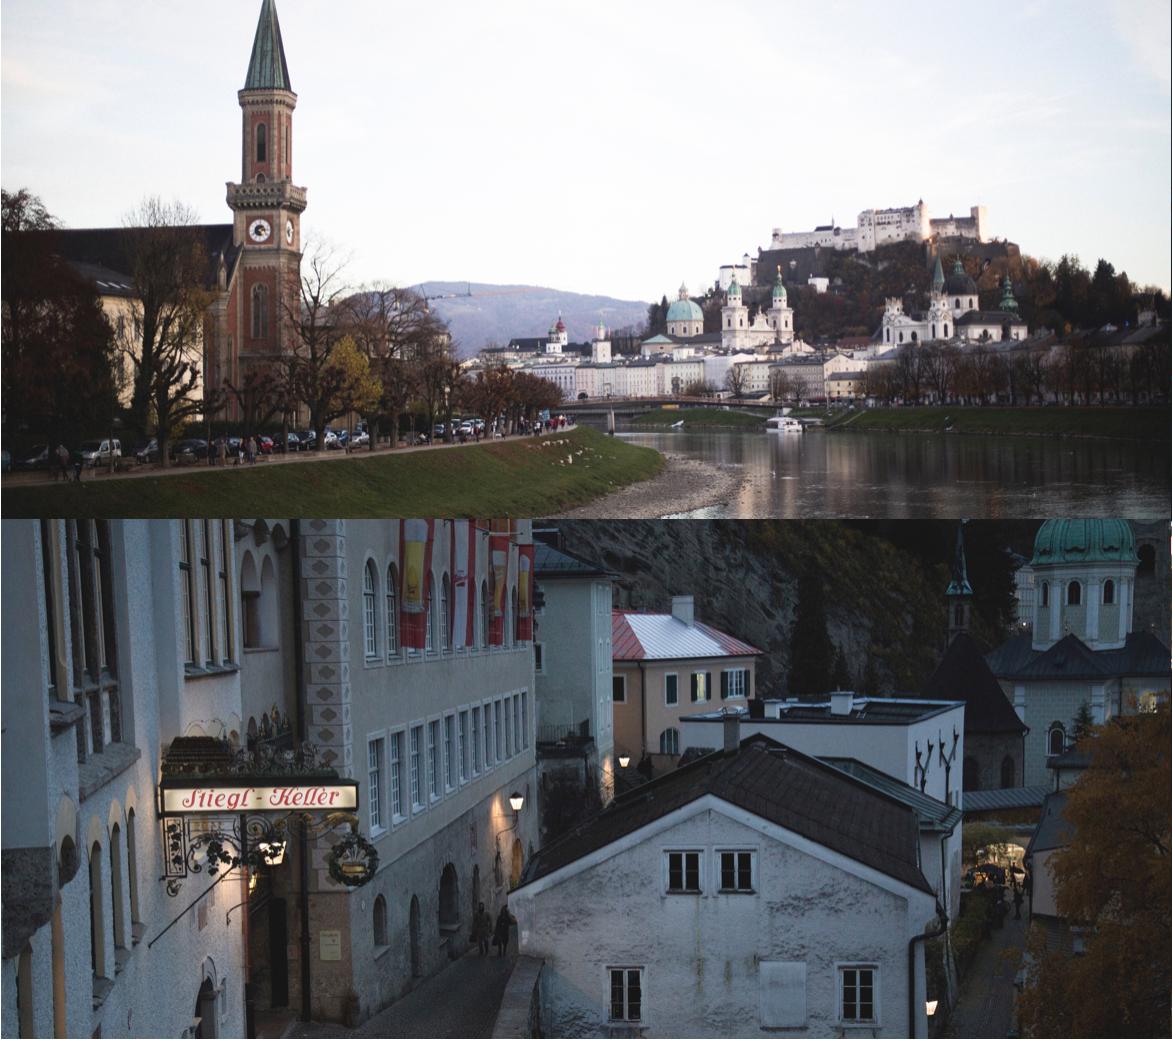 SALZBURG - THE ALPS, MOZART & THE SOUND OF MUSIC